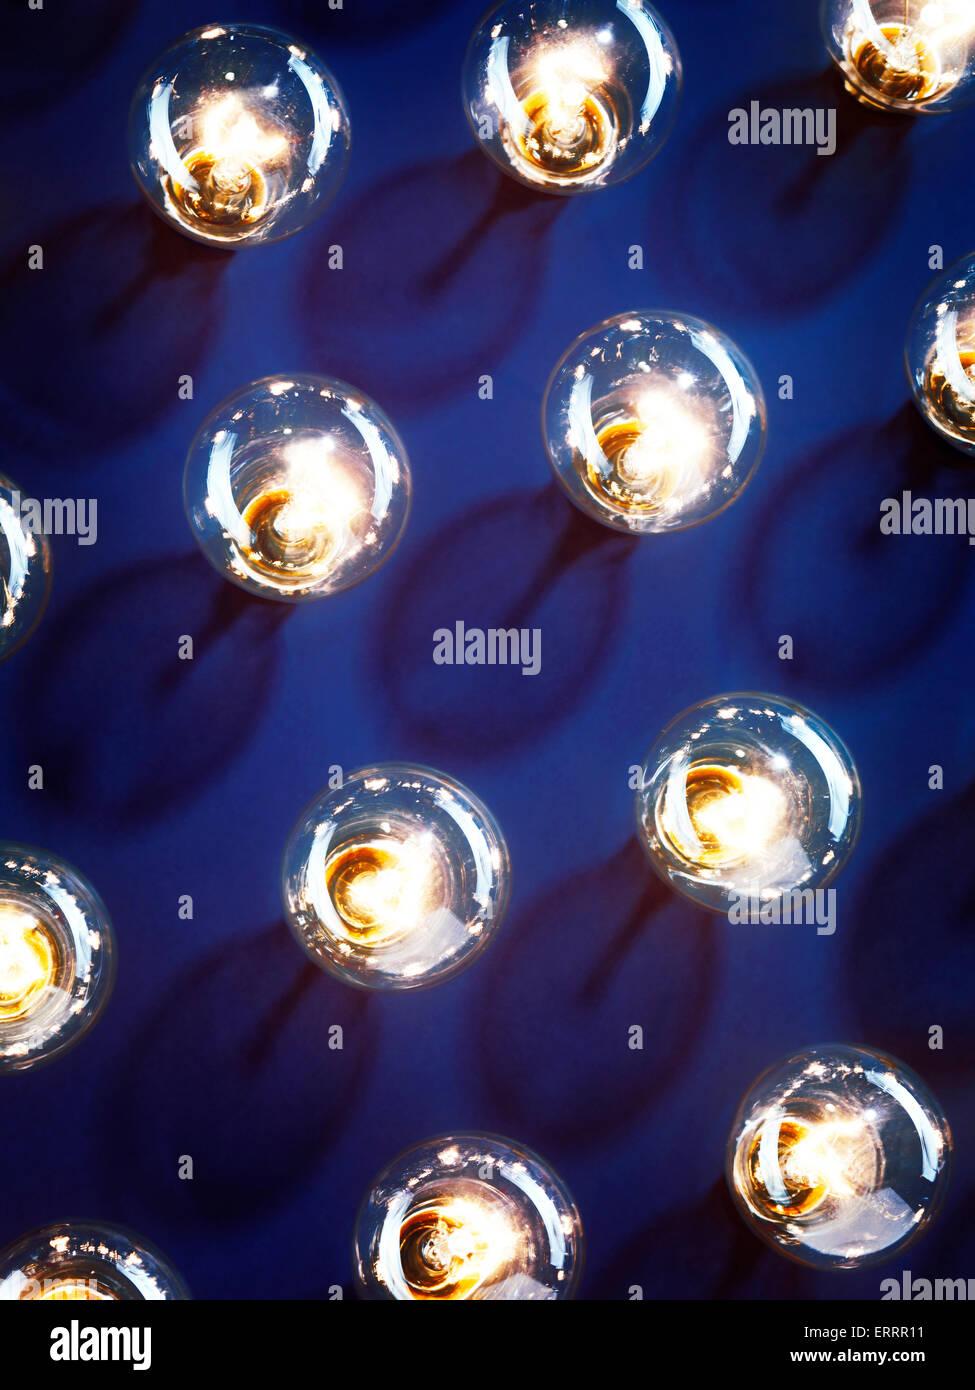 Un grupo de bombillas de luz incandescente iluminada brilla sobre fondo azul. Imagen De Stock